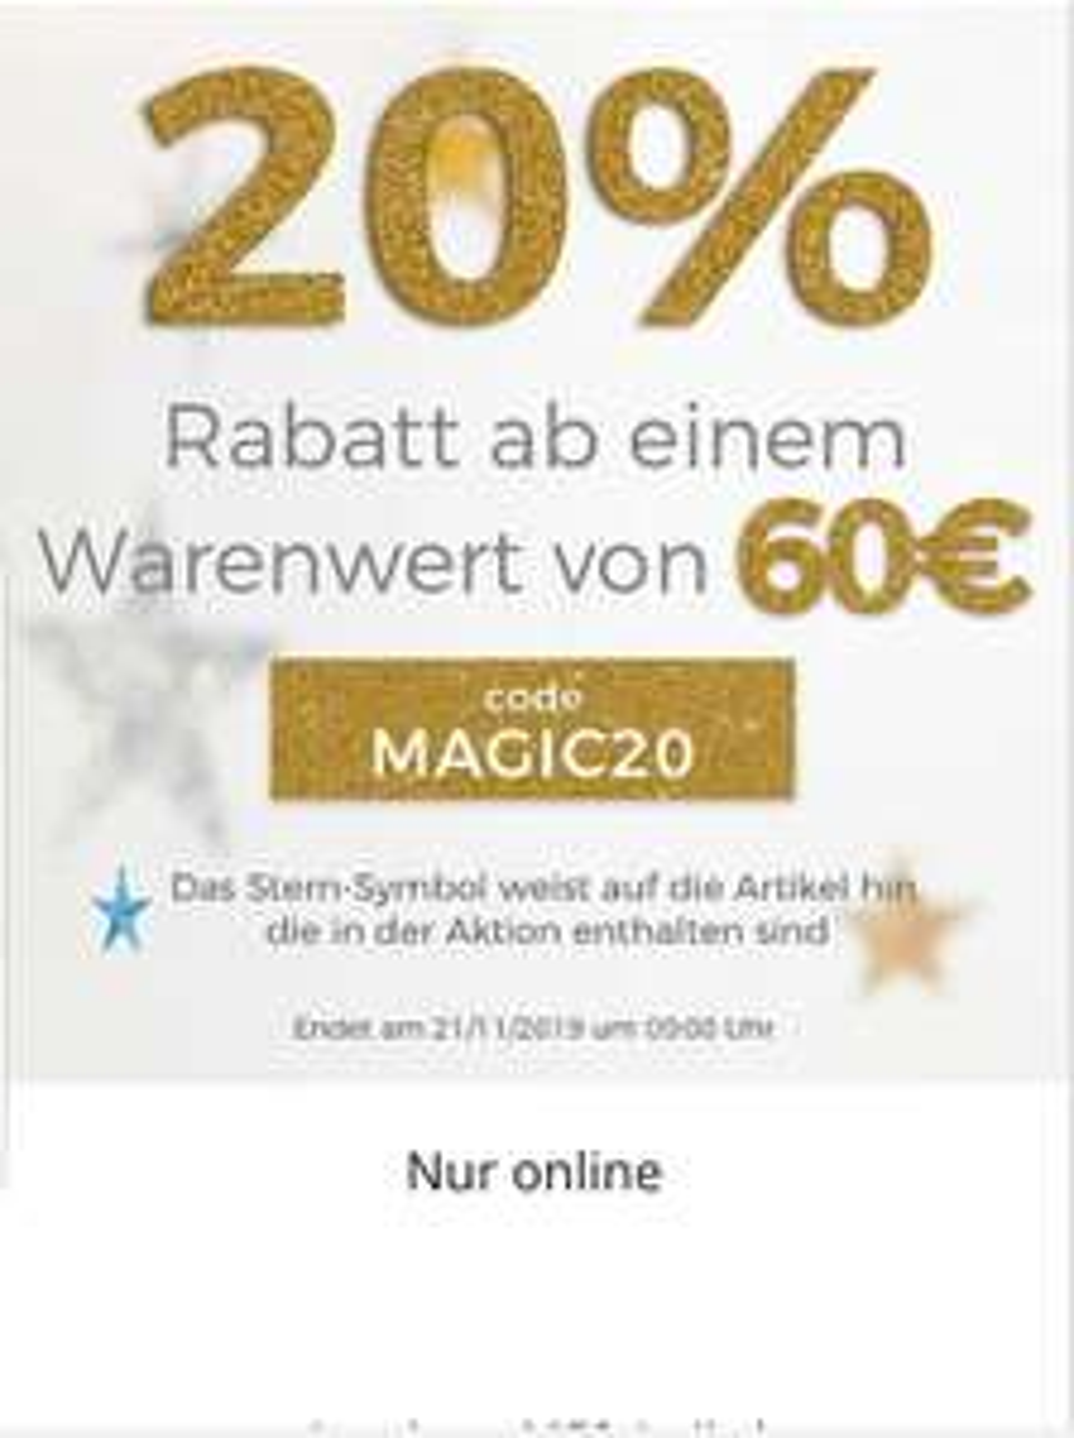 20% Rabatt im Disneyshop (nur online)